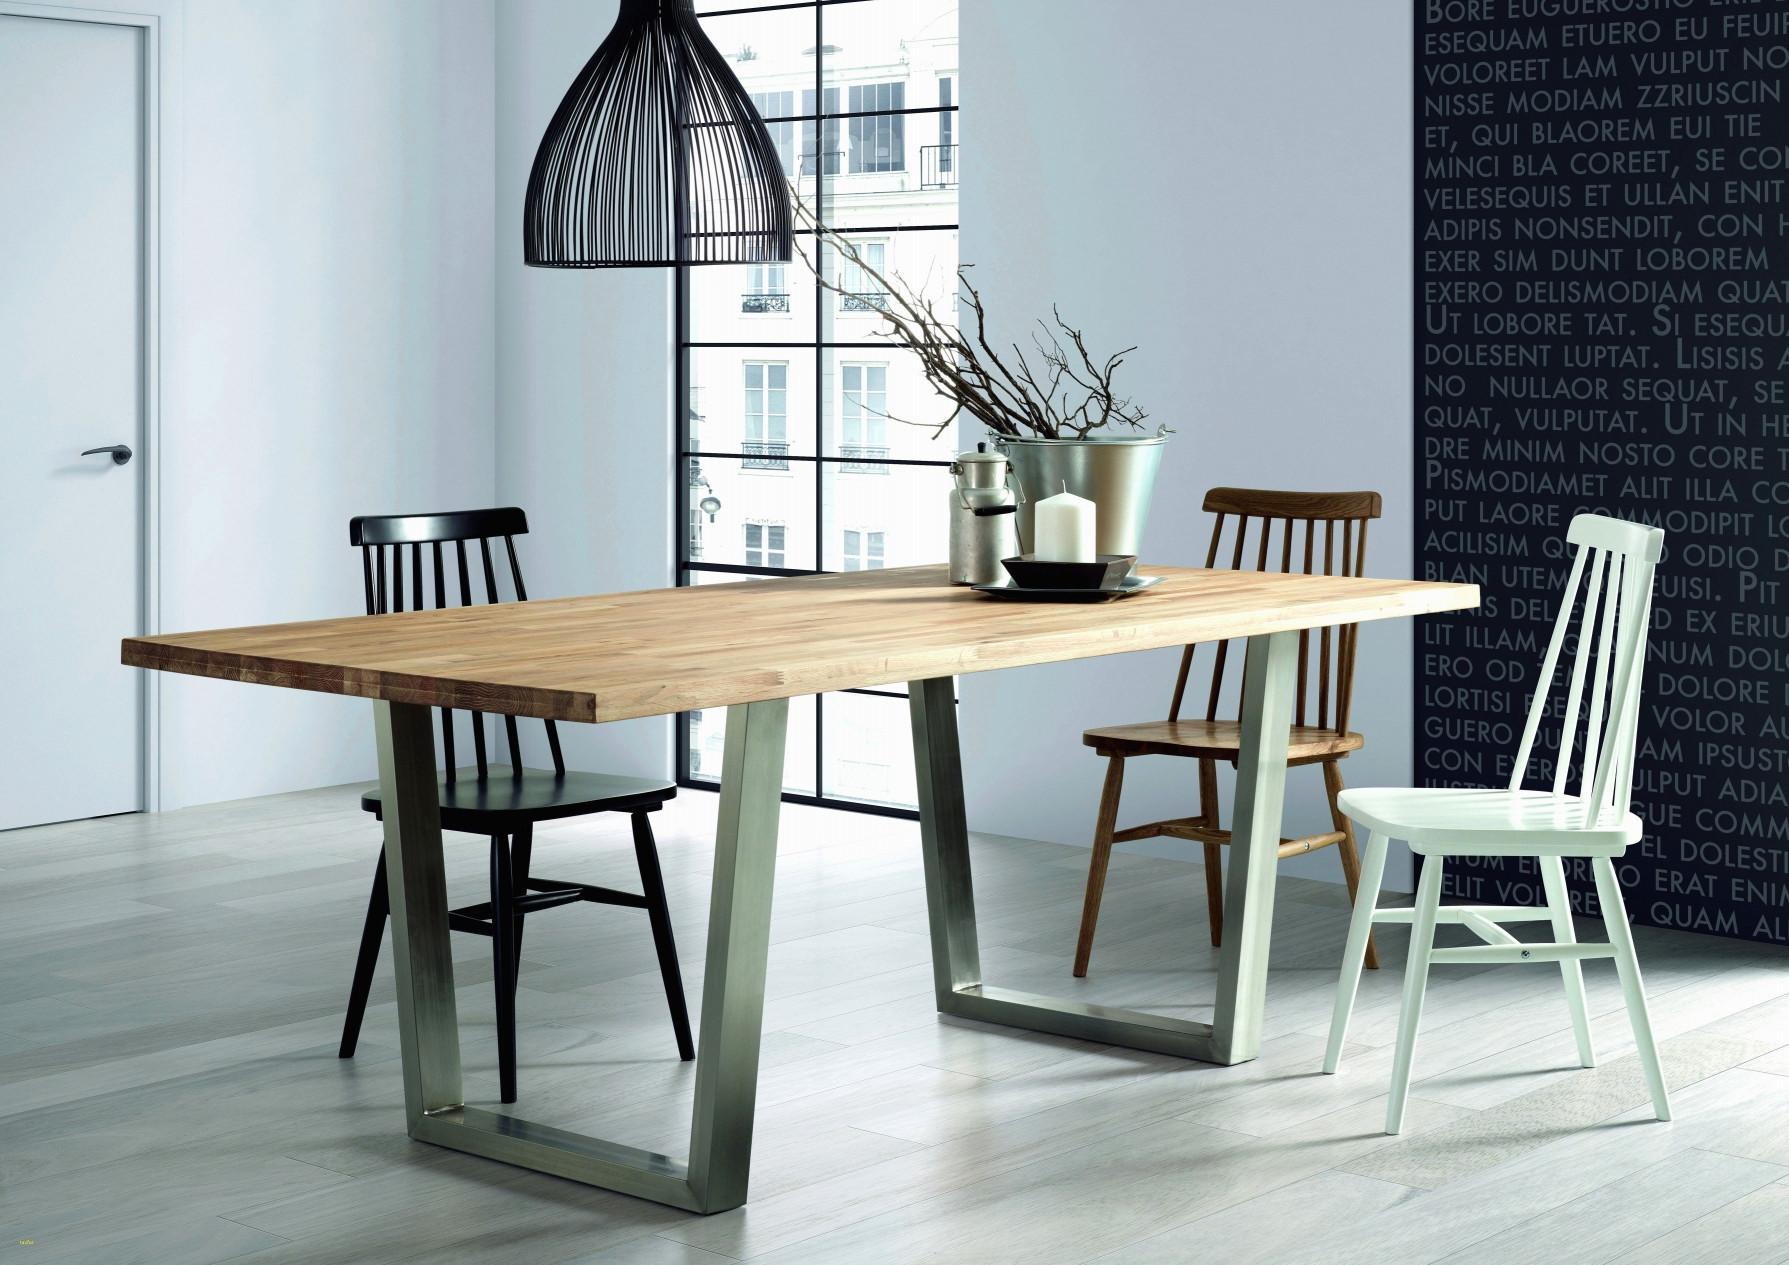 magasin de meuble annemasse luxe lesmeubles idee bureau ikea beau meubles besta meuble blanc 0d of magasin de meuble annemasse